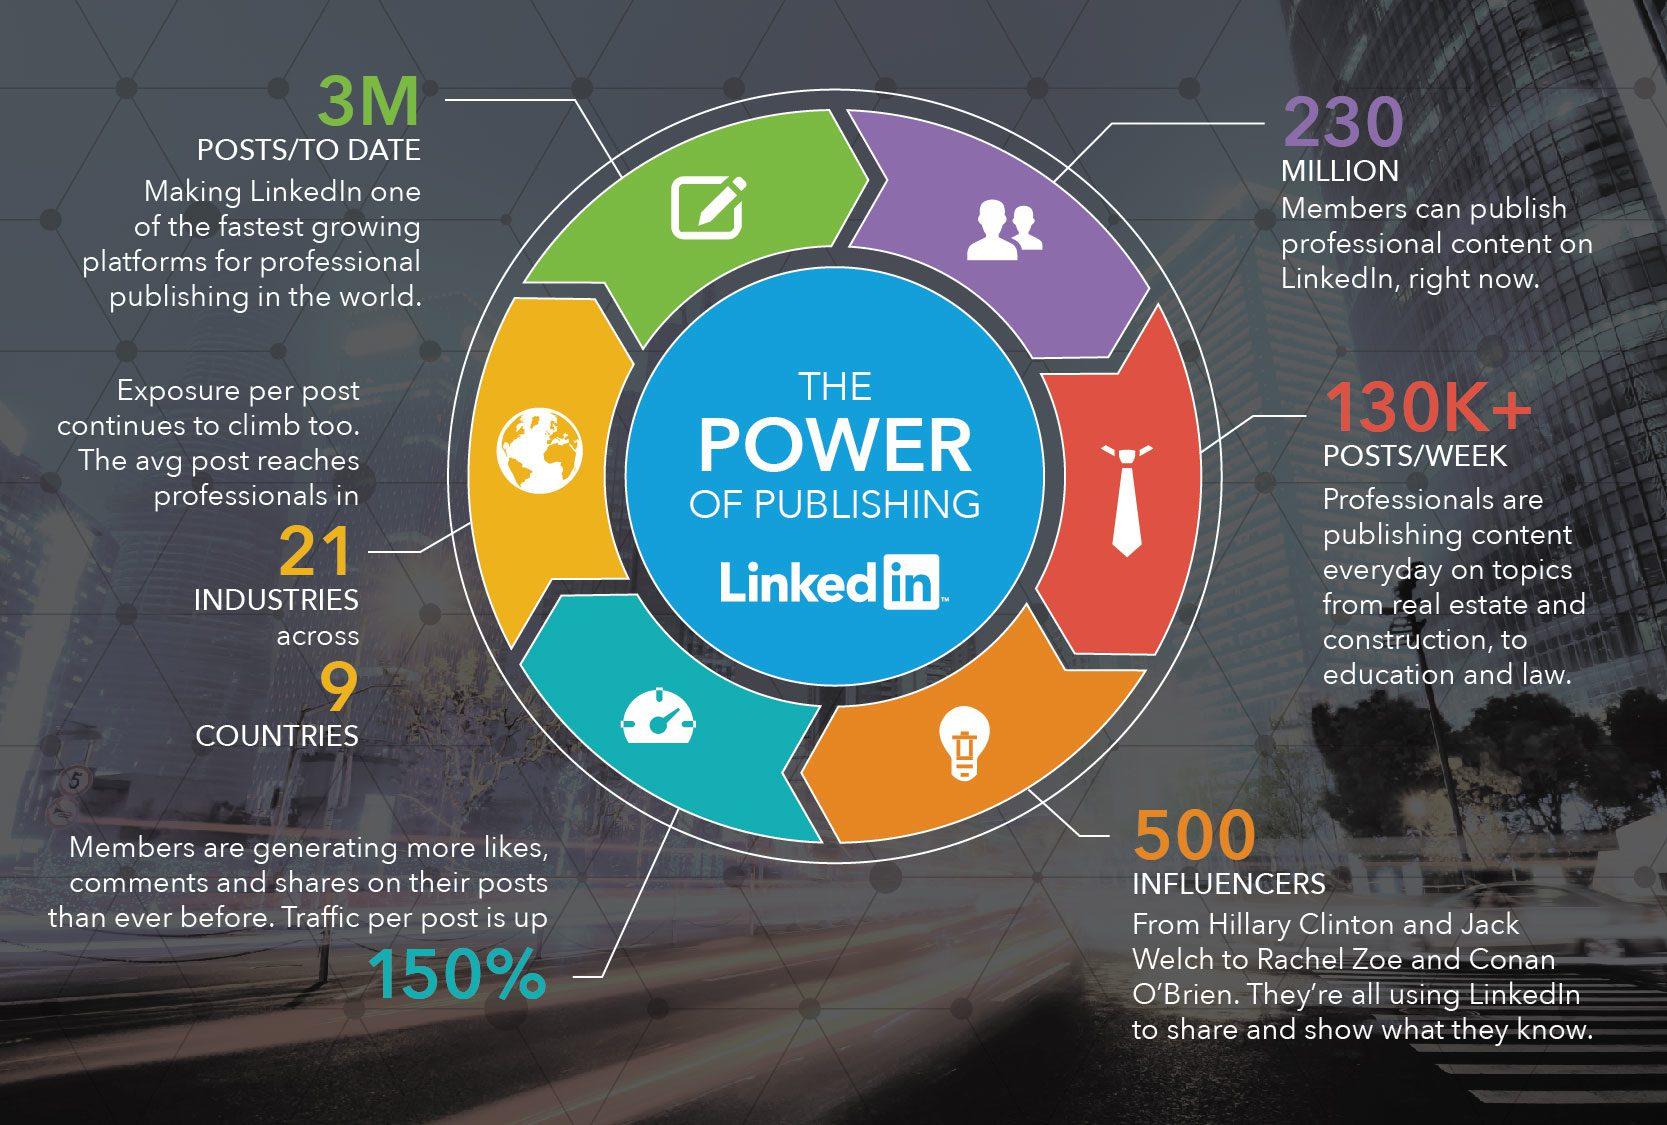 benefits of using LinkedIn Pulse